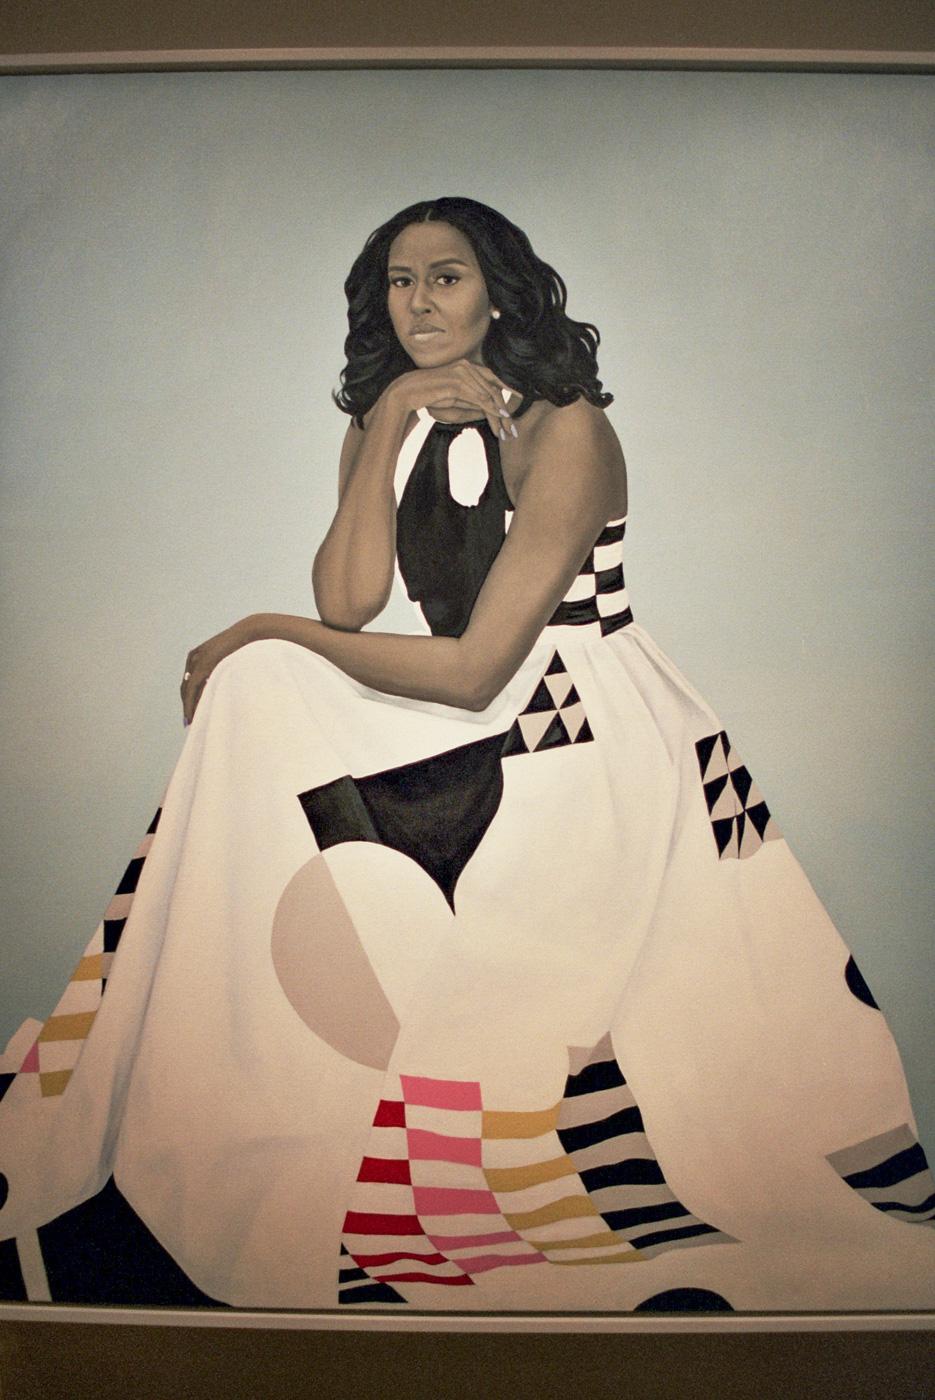 Michelle Obama's Portrait by Amy Sherald